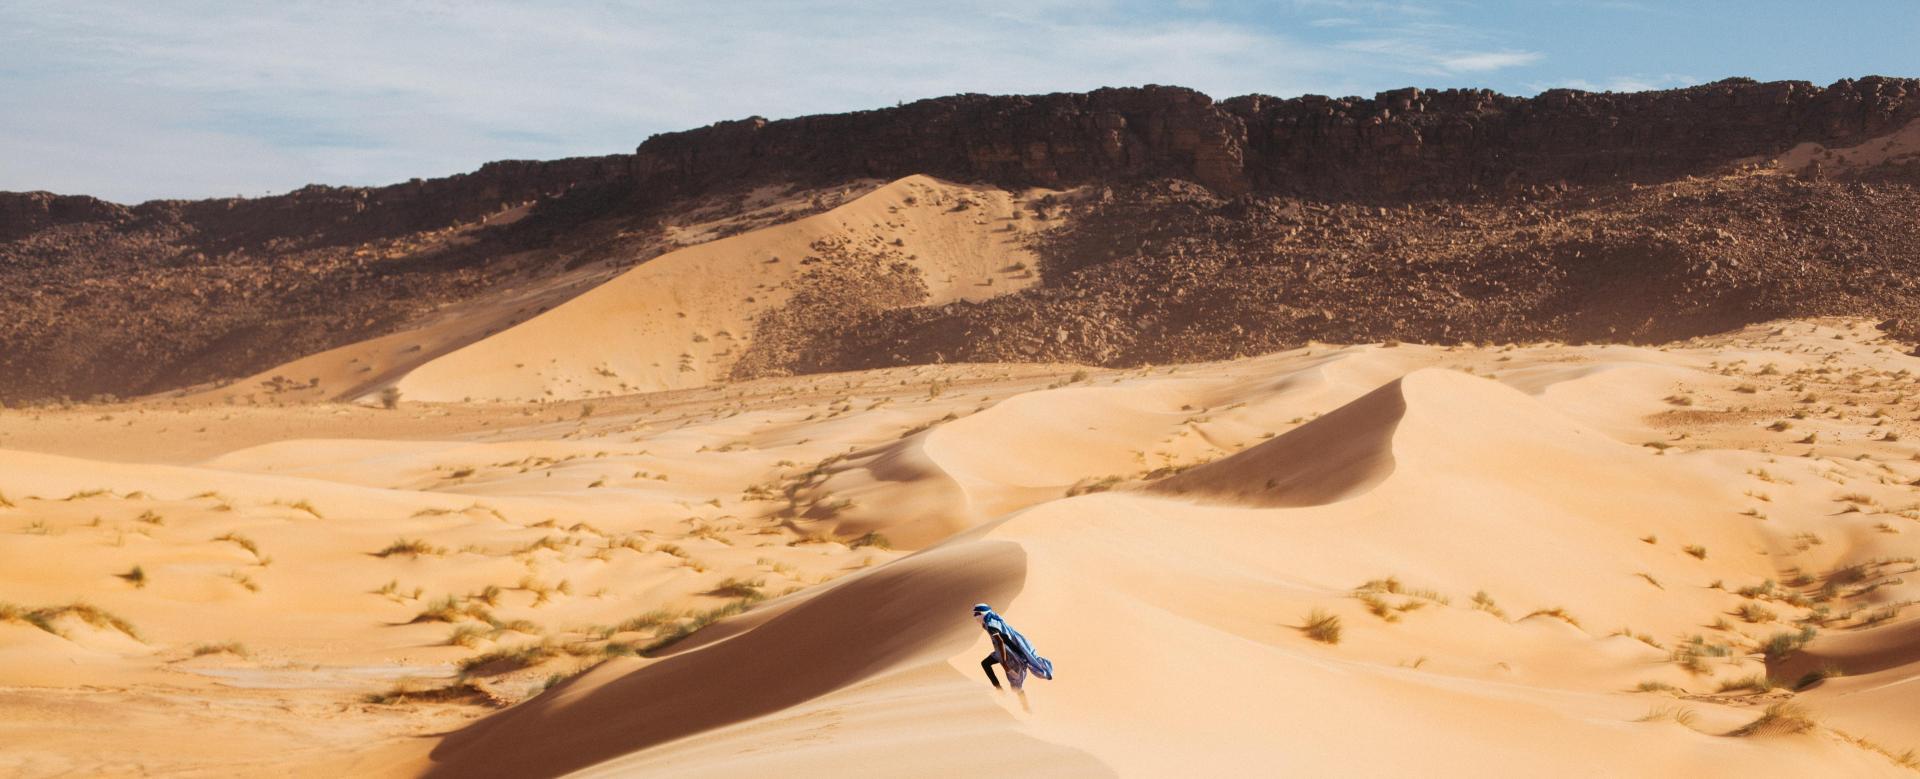 Voyage à pied : Mauritanie : Kaléidoscope saharien